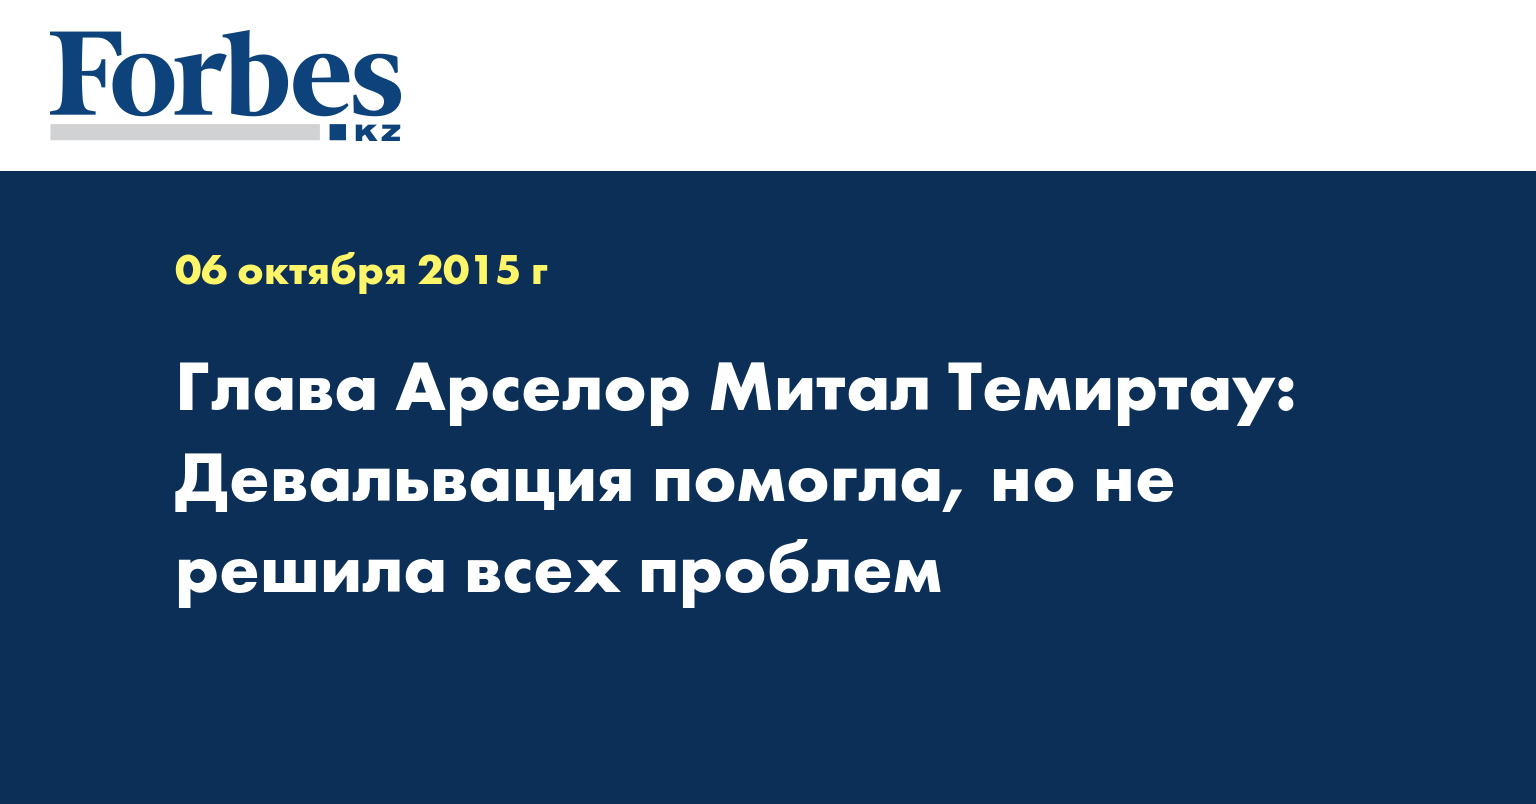 Глава Арселор Митал Темиртау: Девальвация помогла, но не решила всех проблем